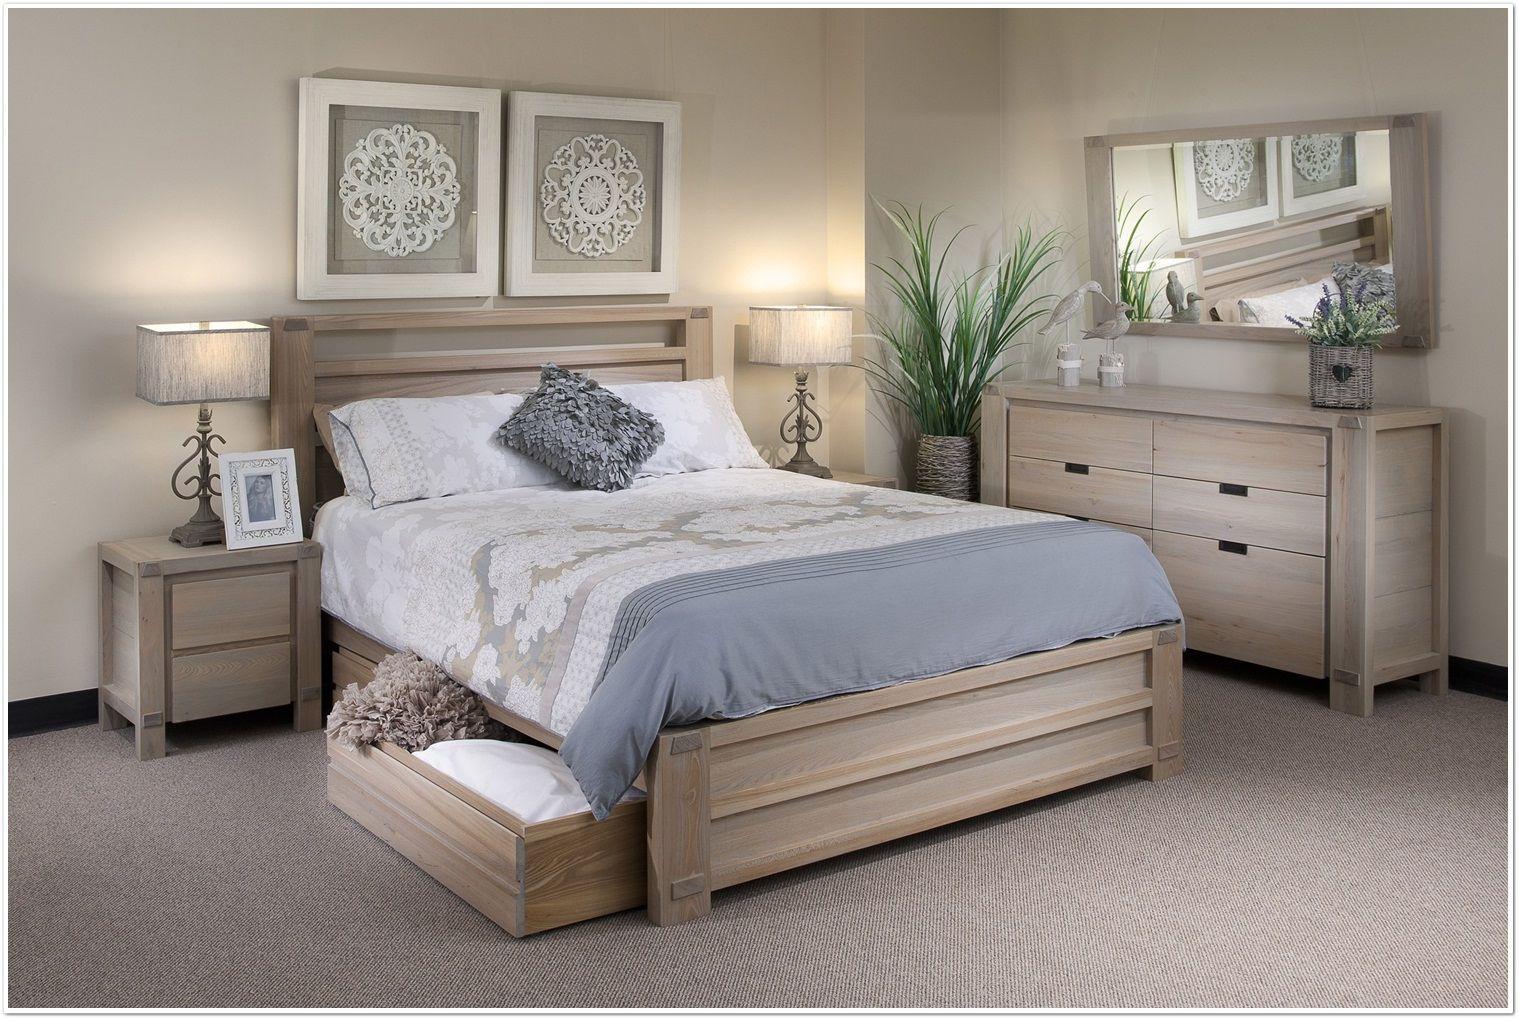 Bedroom French Coastal Barbados Furniture White Washed Wood Sets